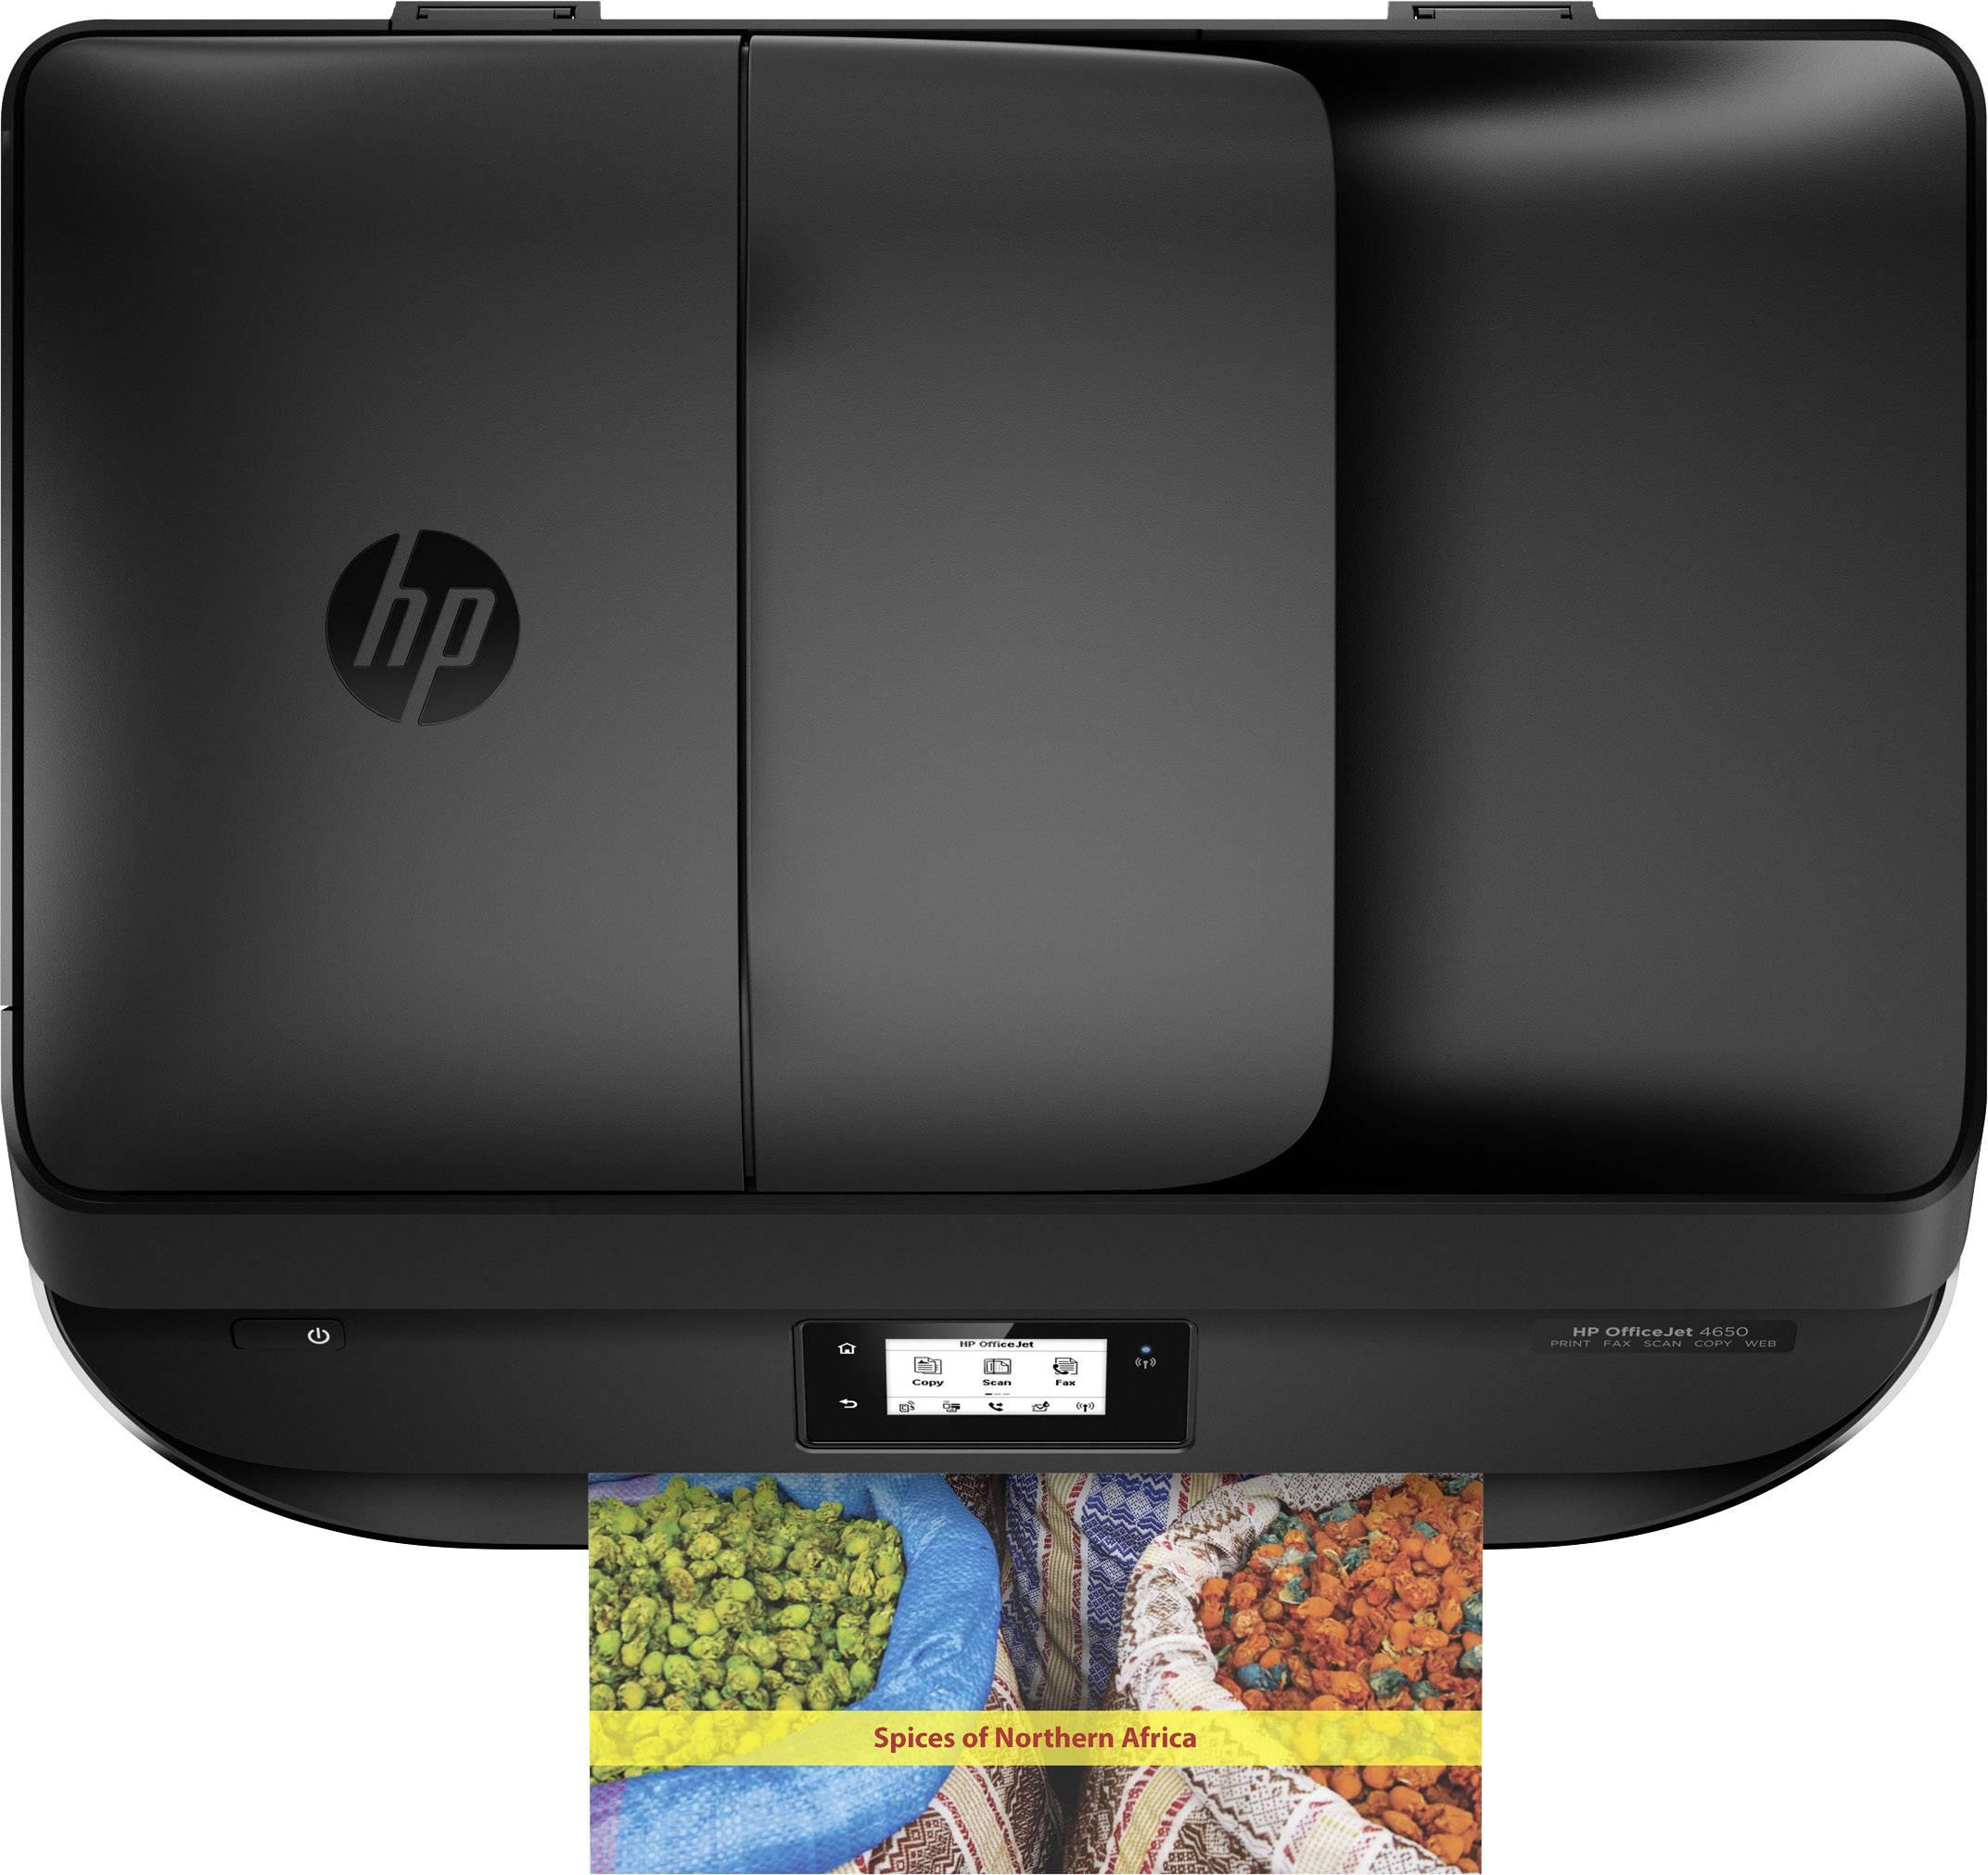 HP OfficeJet 4650 All-in-One Inkjet multifunction printer A4 Printer